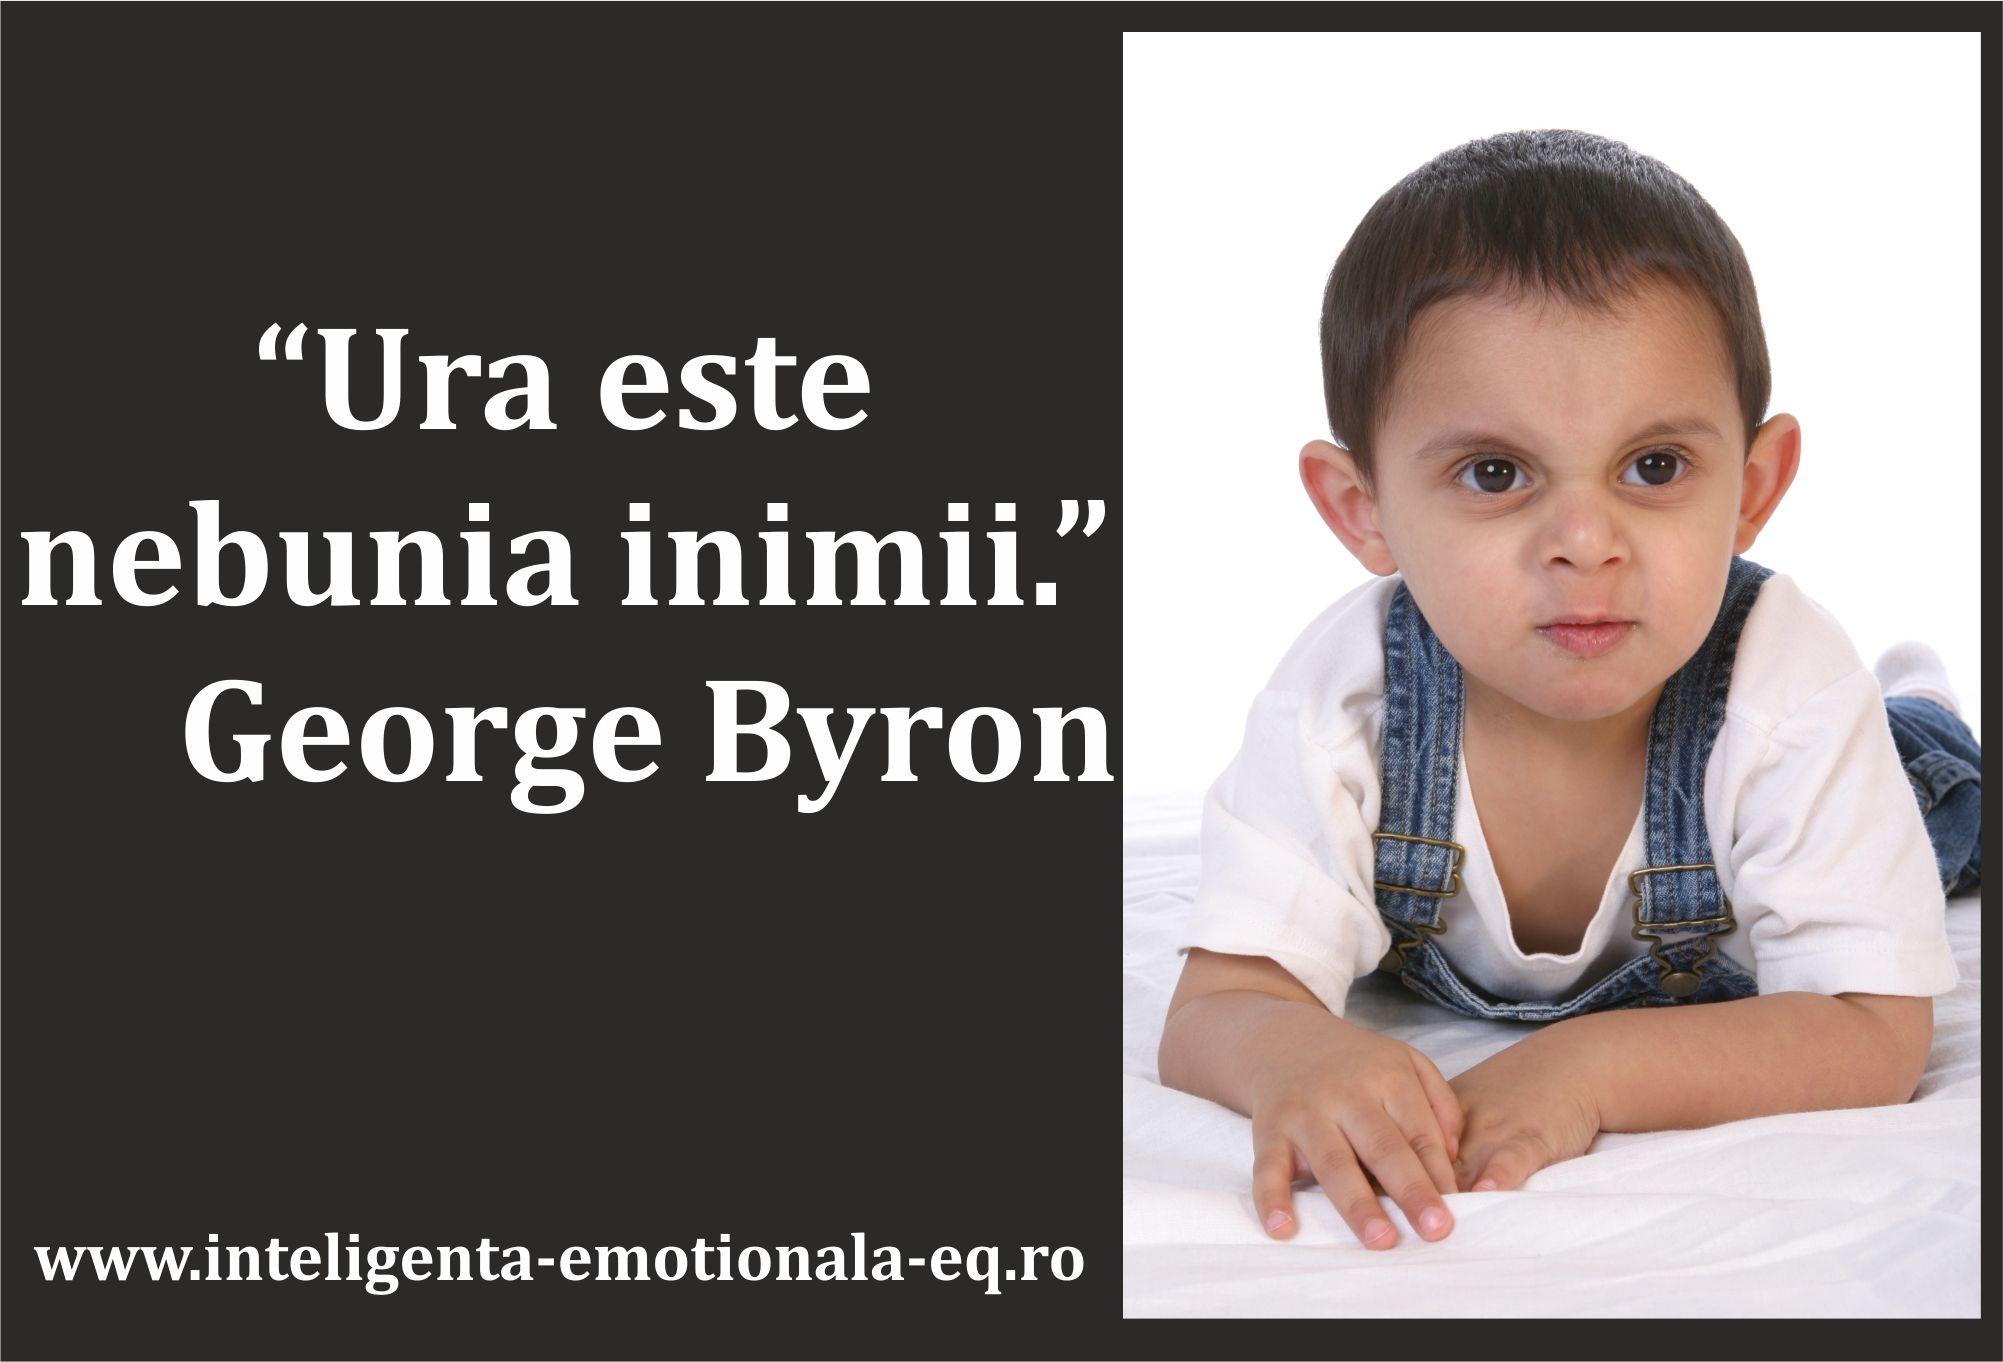 """Ura este nebunia inimii."" George Byron"